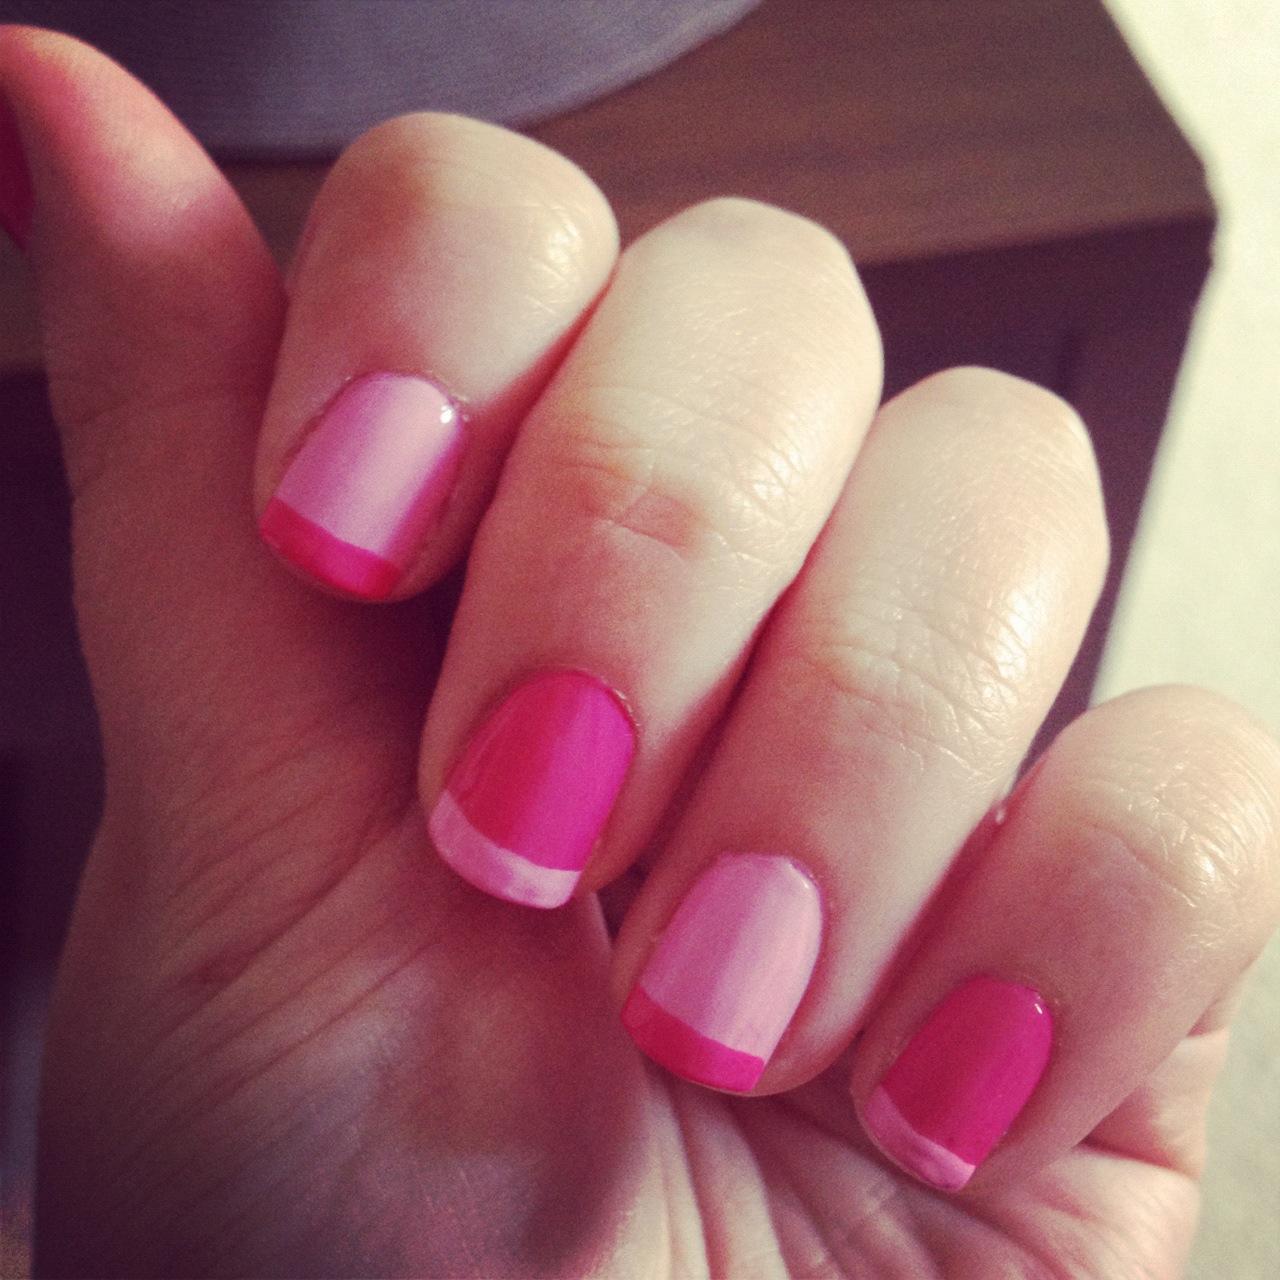 Contrasting Pinks Nail Design.